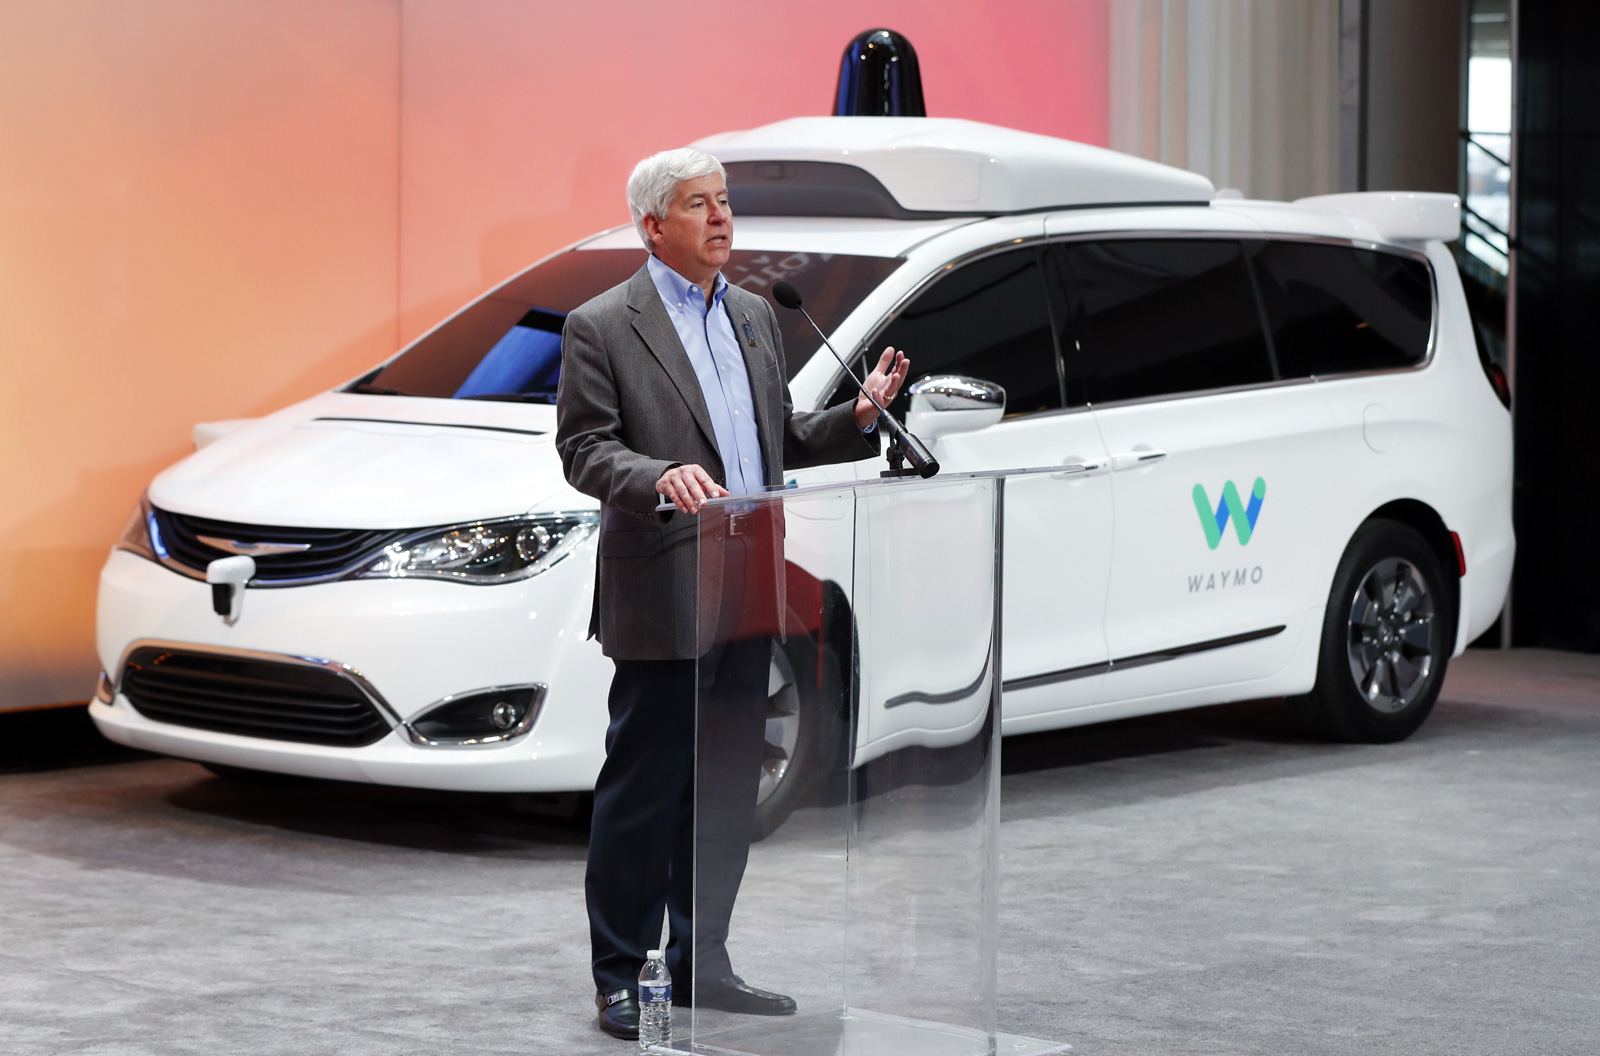 Google Self-Driving Cars Waymo